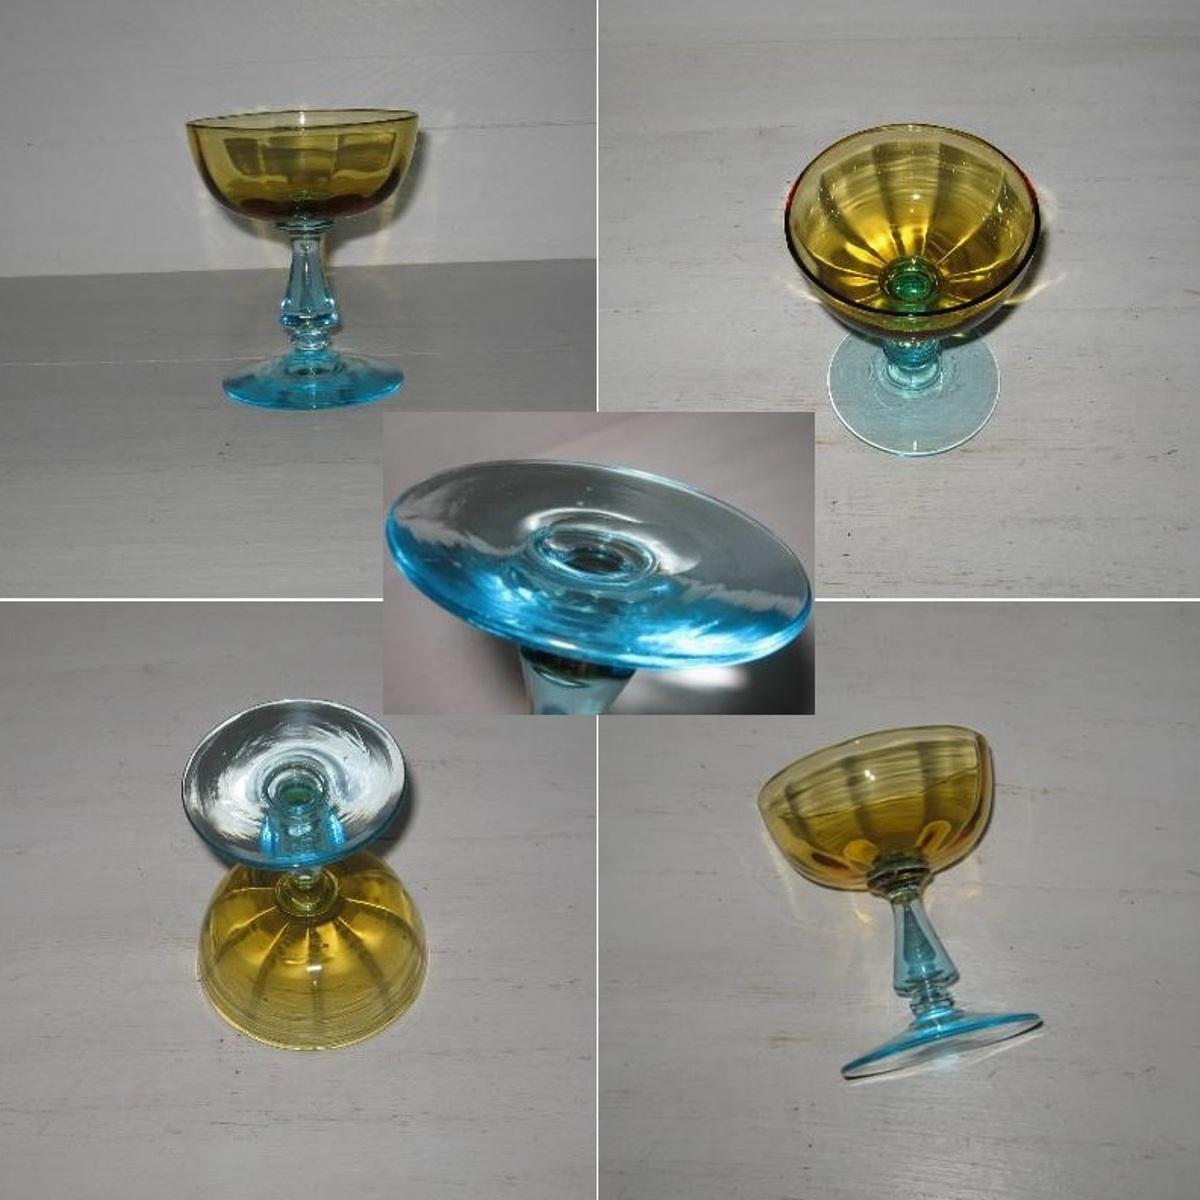 ancienne coupe champagne mod le george sand cristalleries de portieux. Black Bedroom Furniture Sets. Home Design Ideas